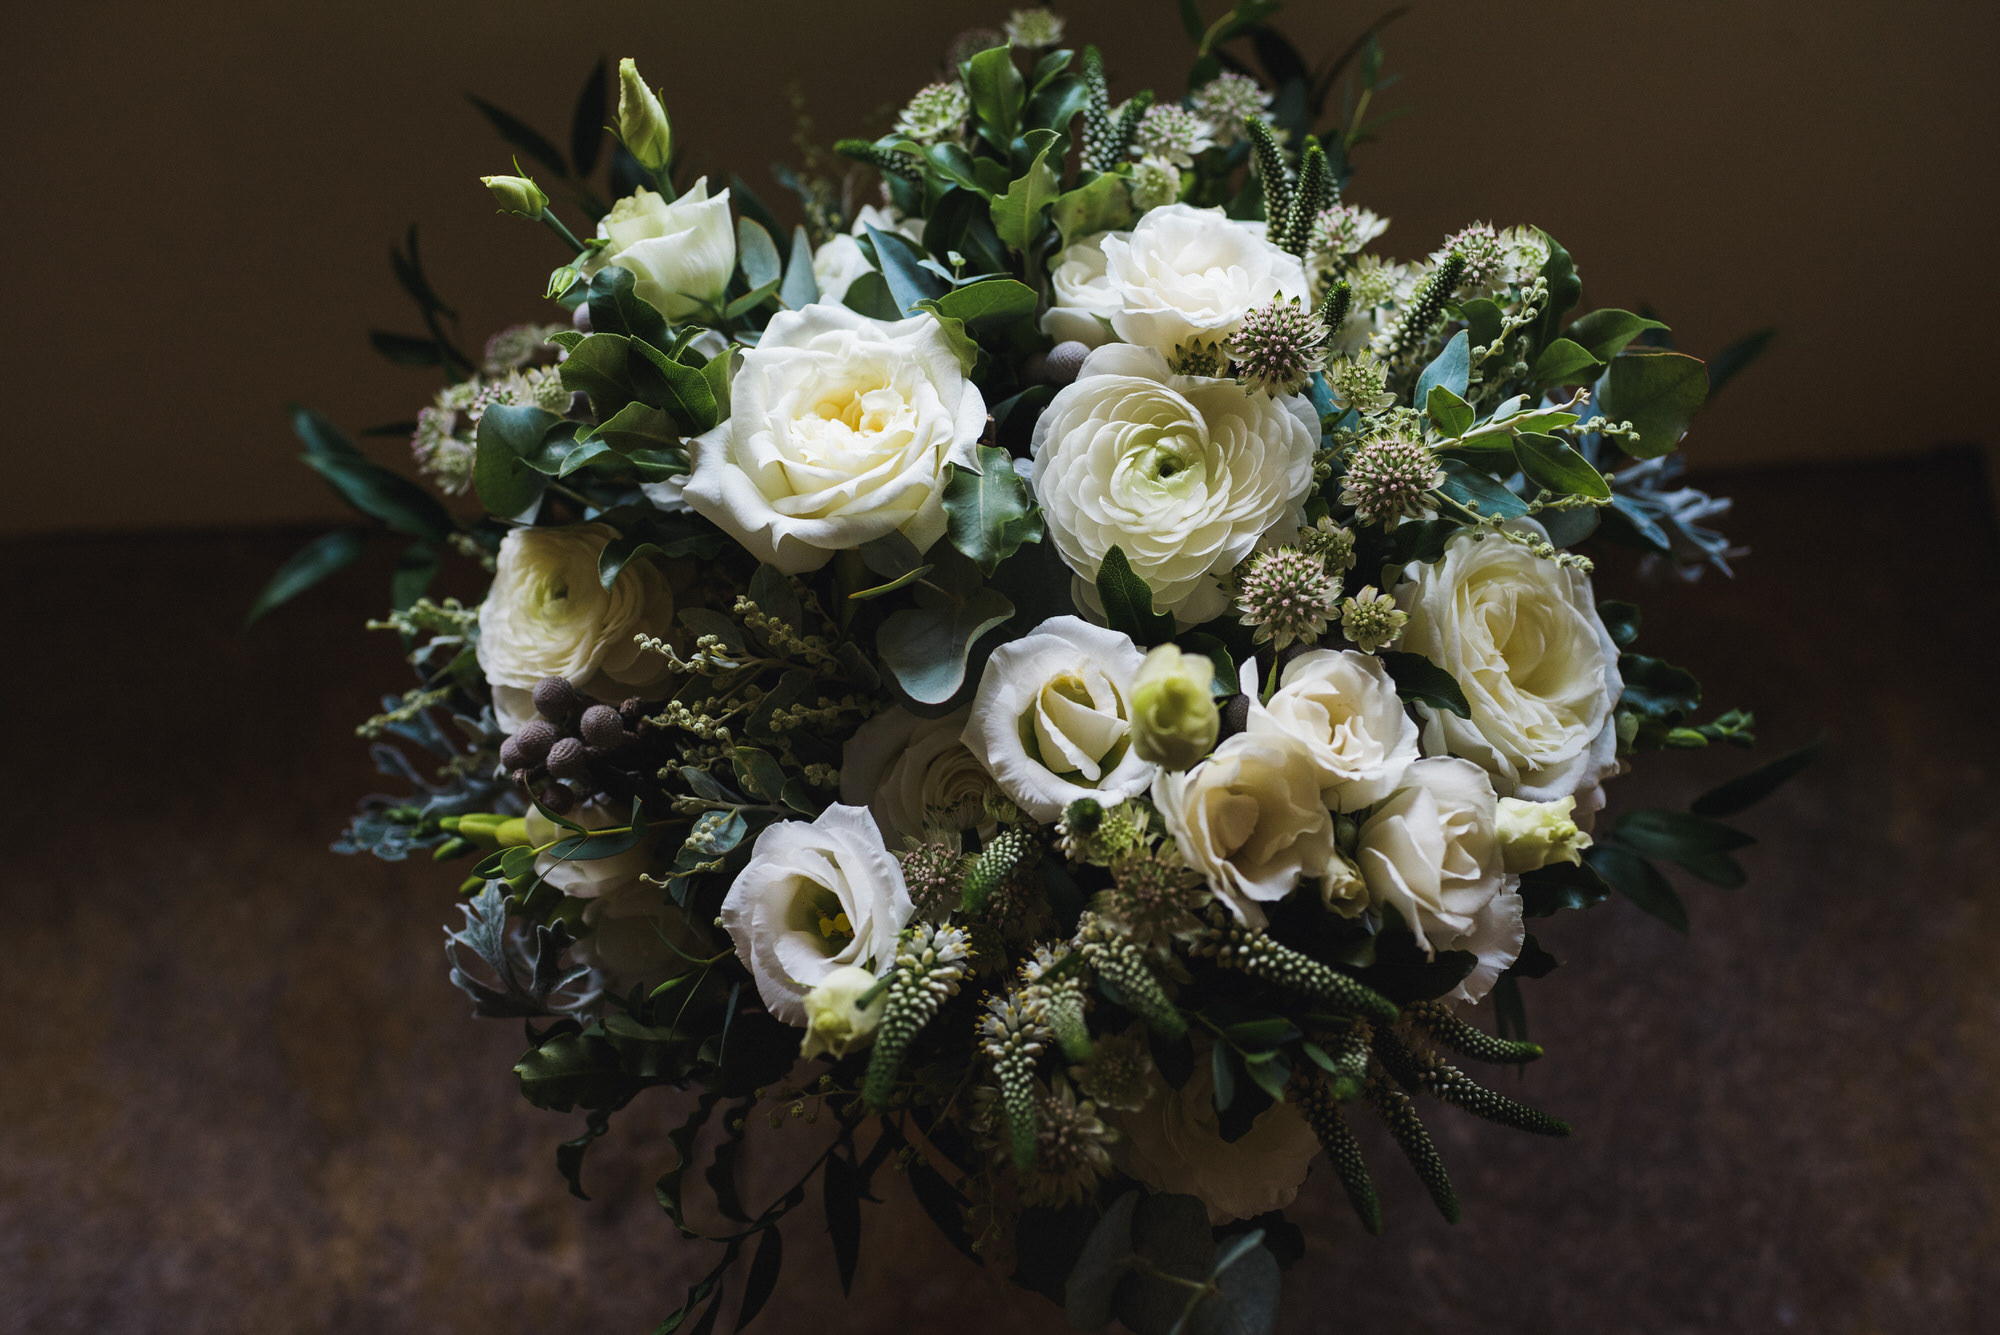 Brympton wedding flowers by simon biffen photography 7